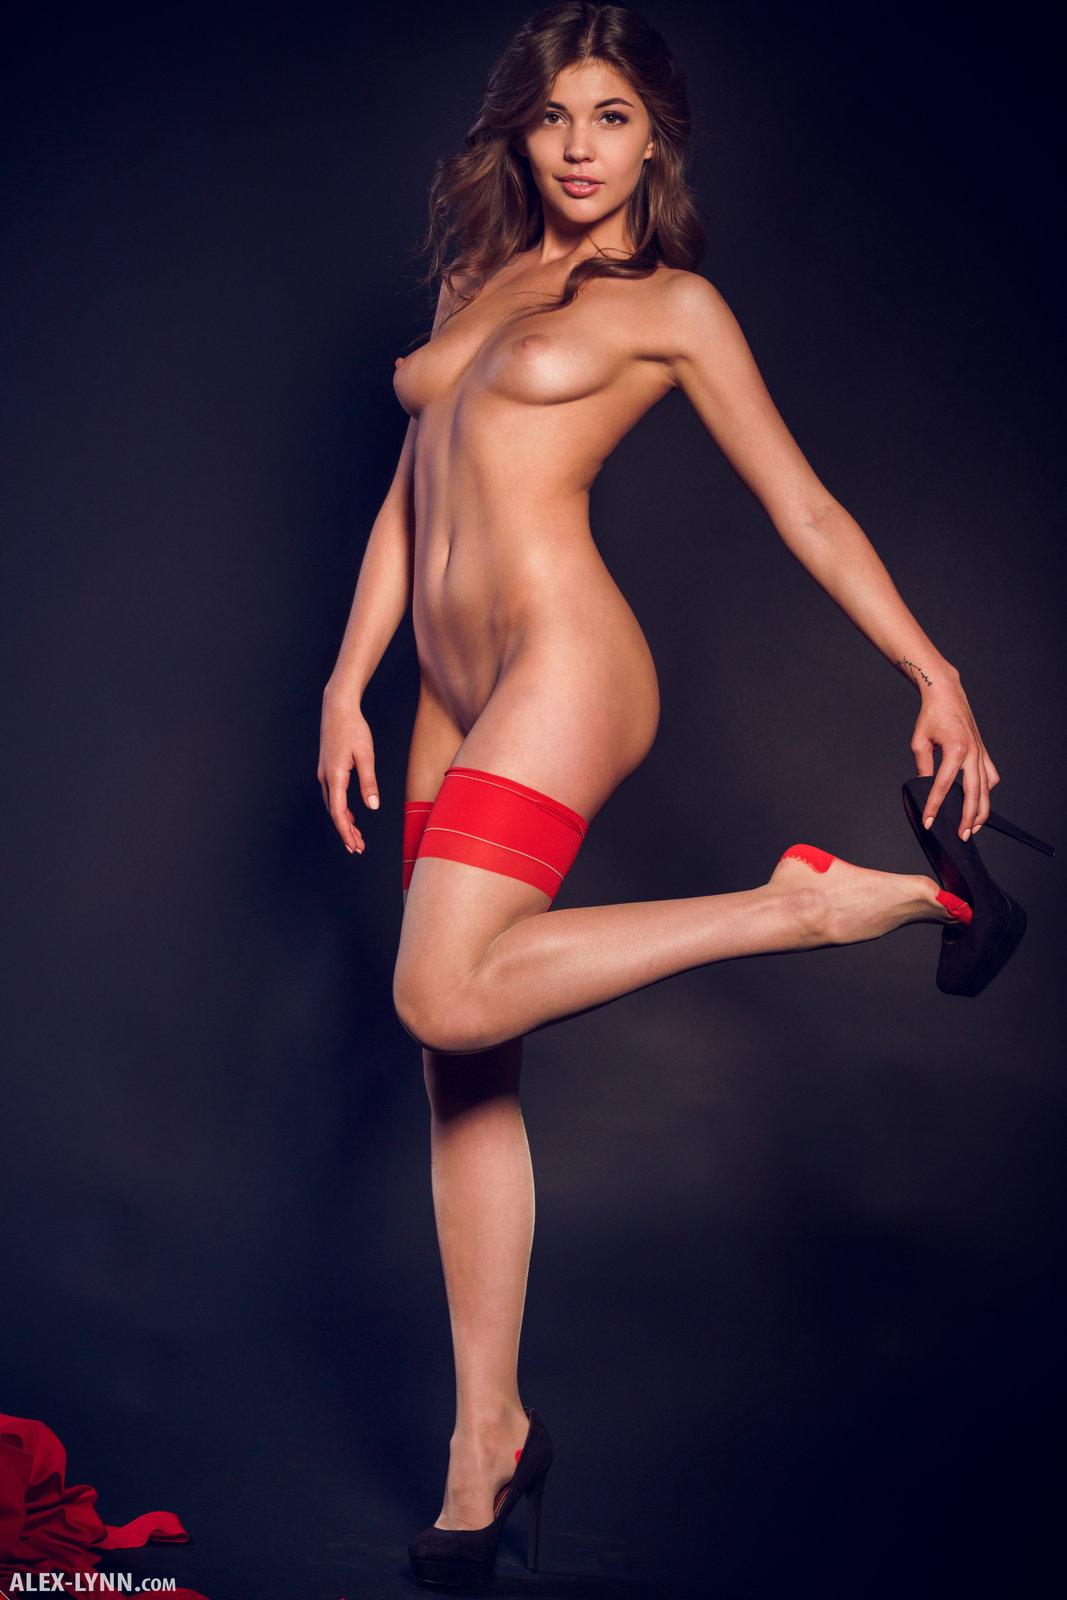 Monika Dee in Red And Black by Alex-Lynn (15 photos ...